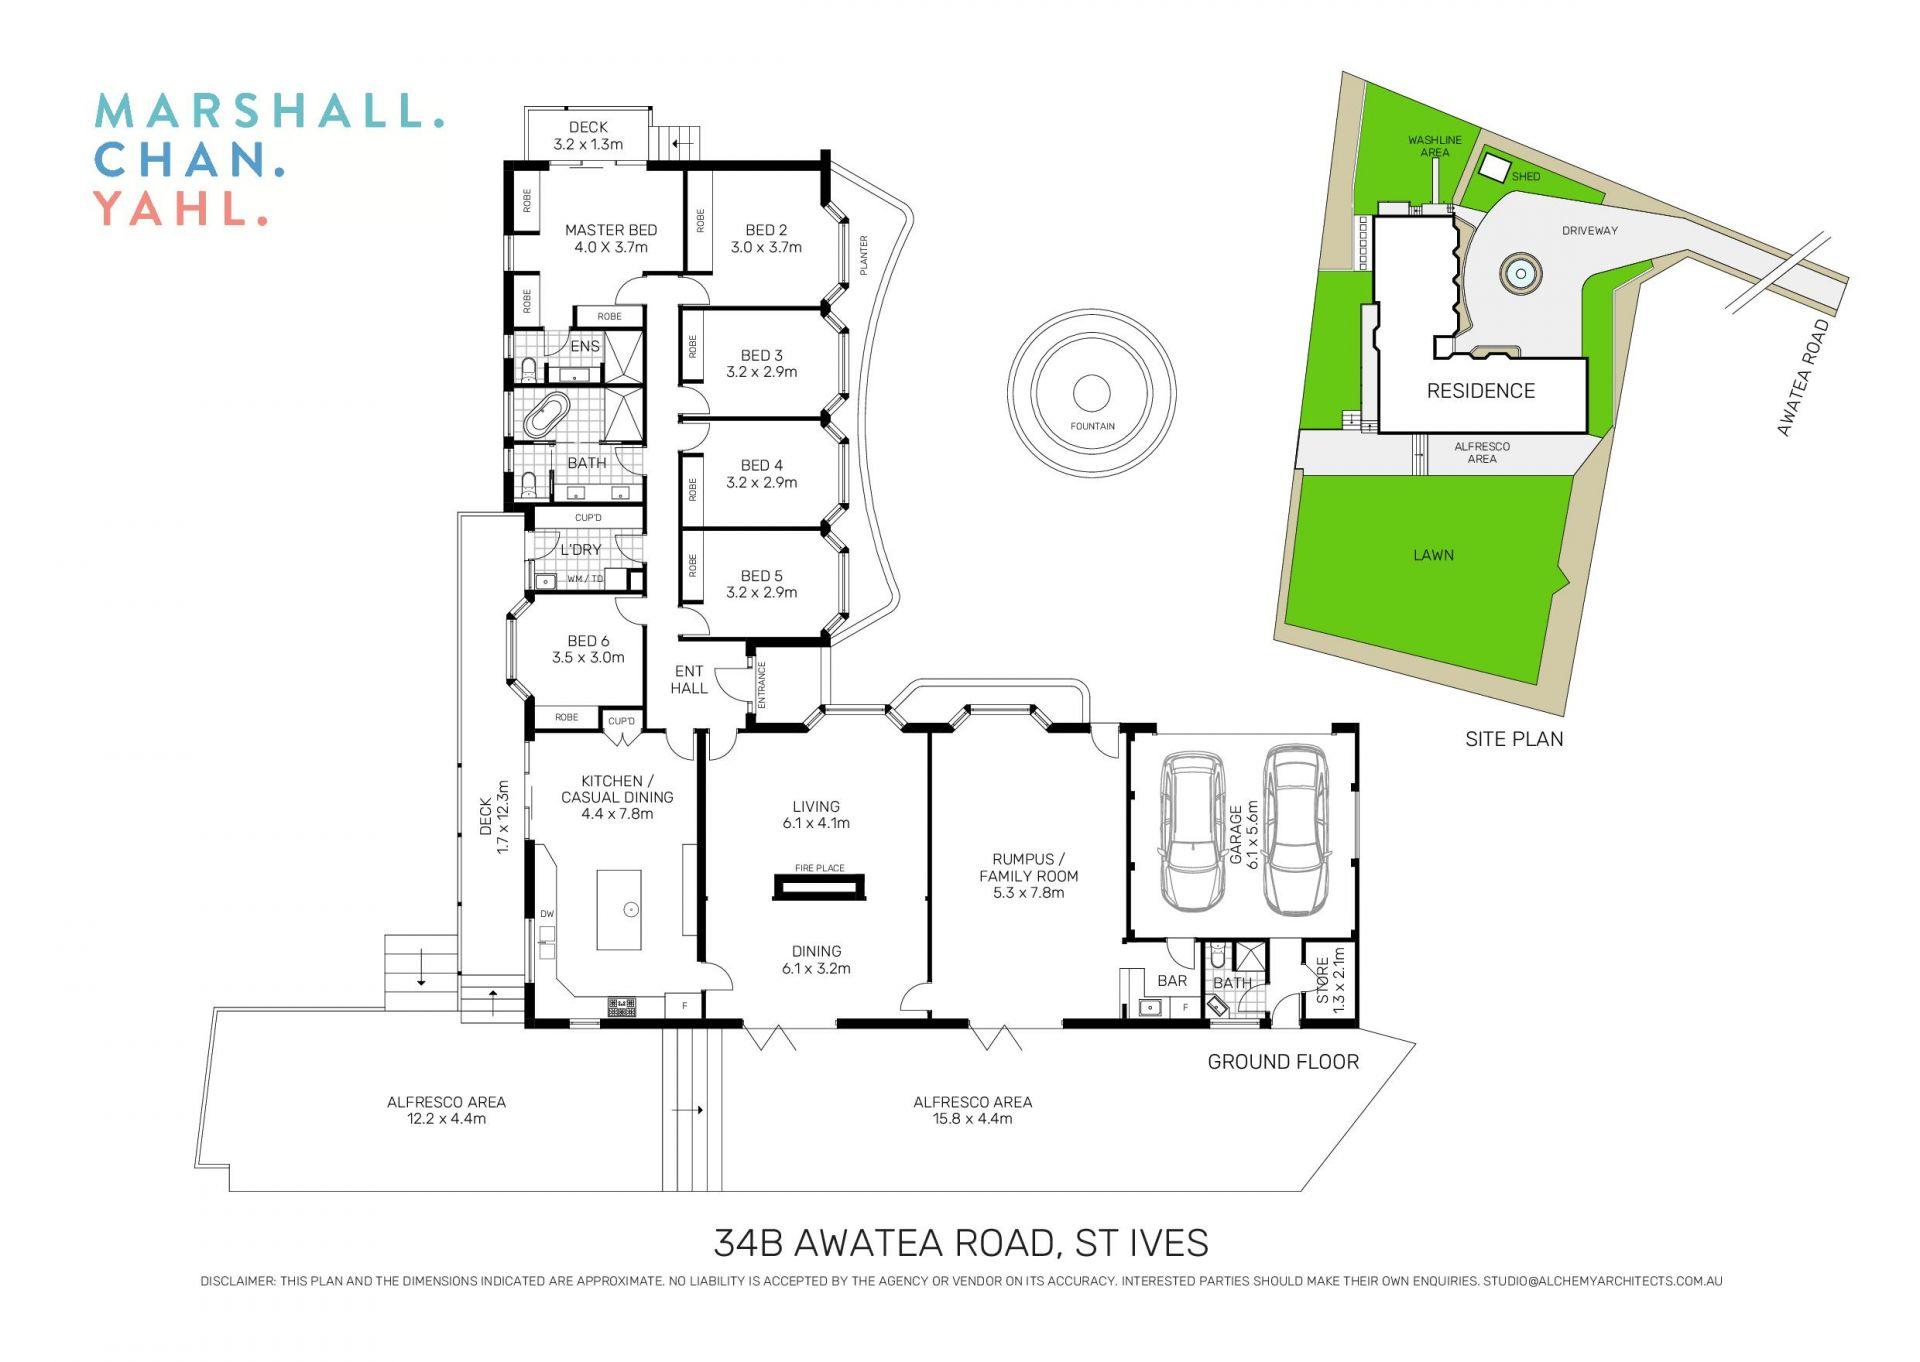 34B Awatea Road St Ives 2075